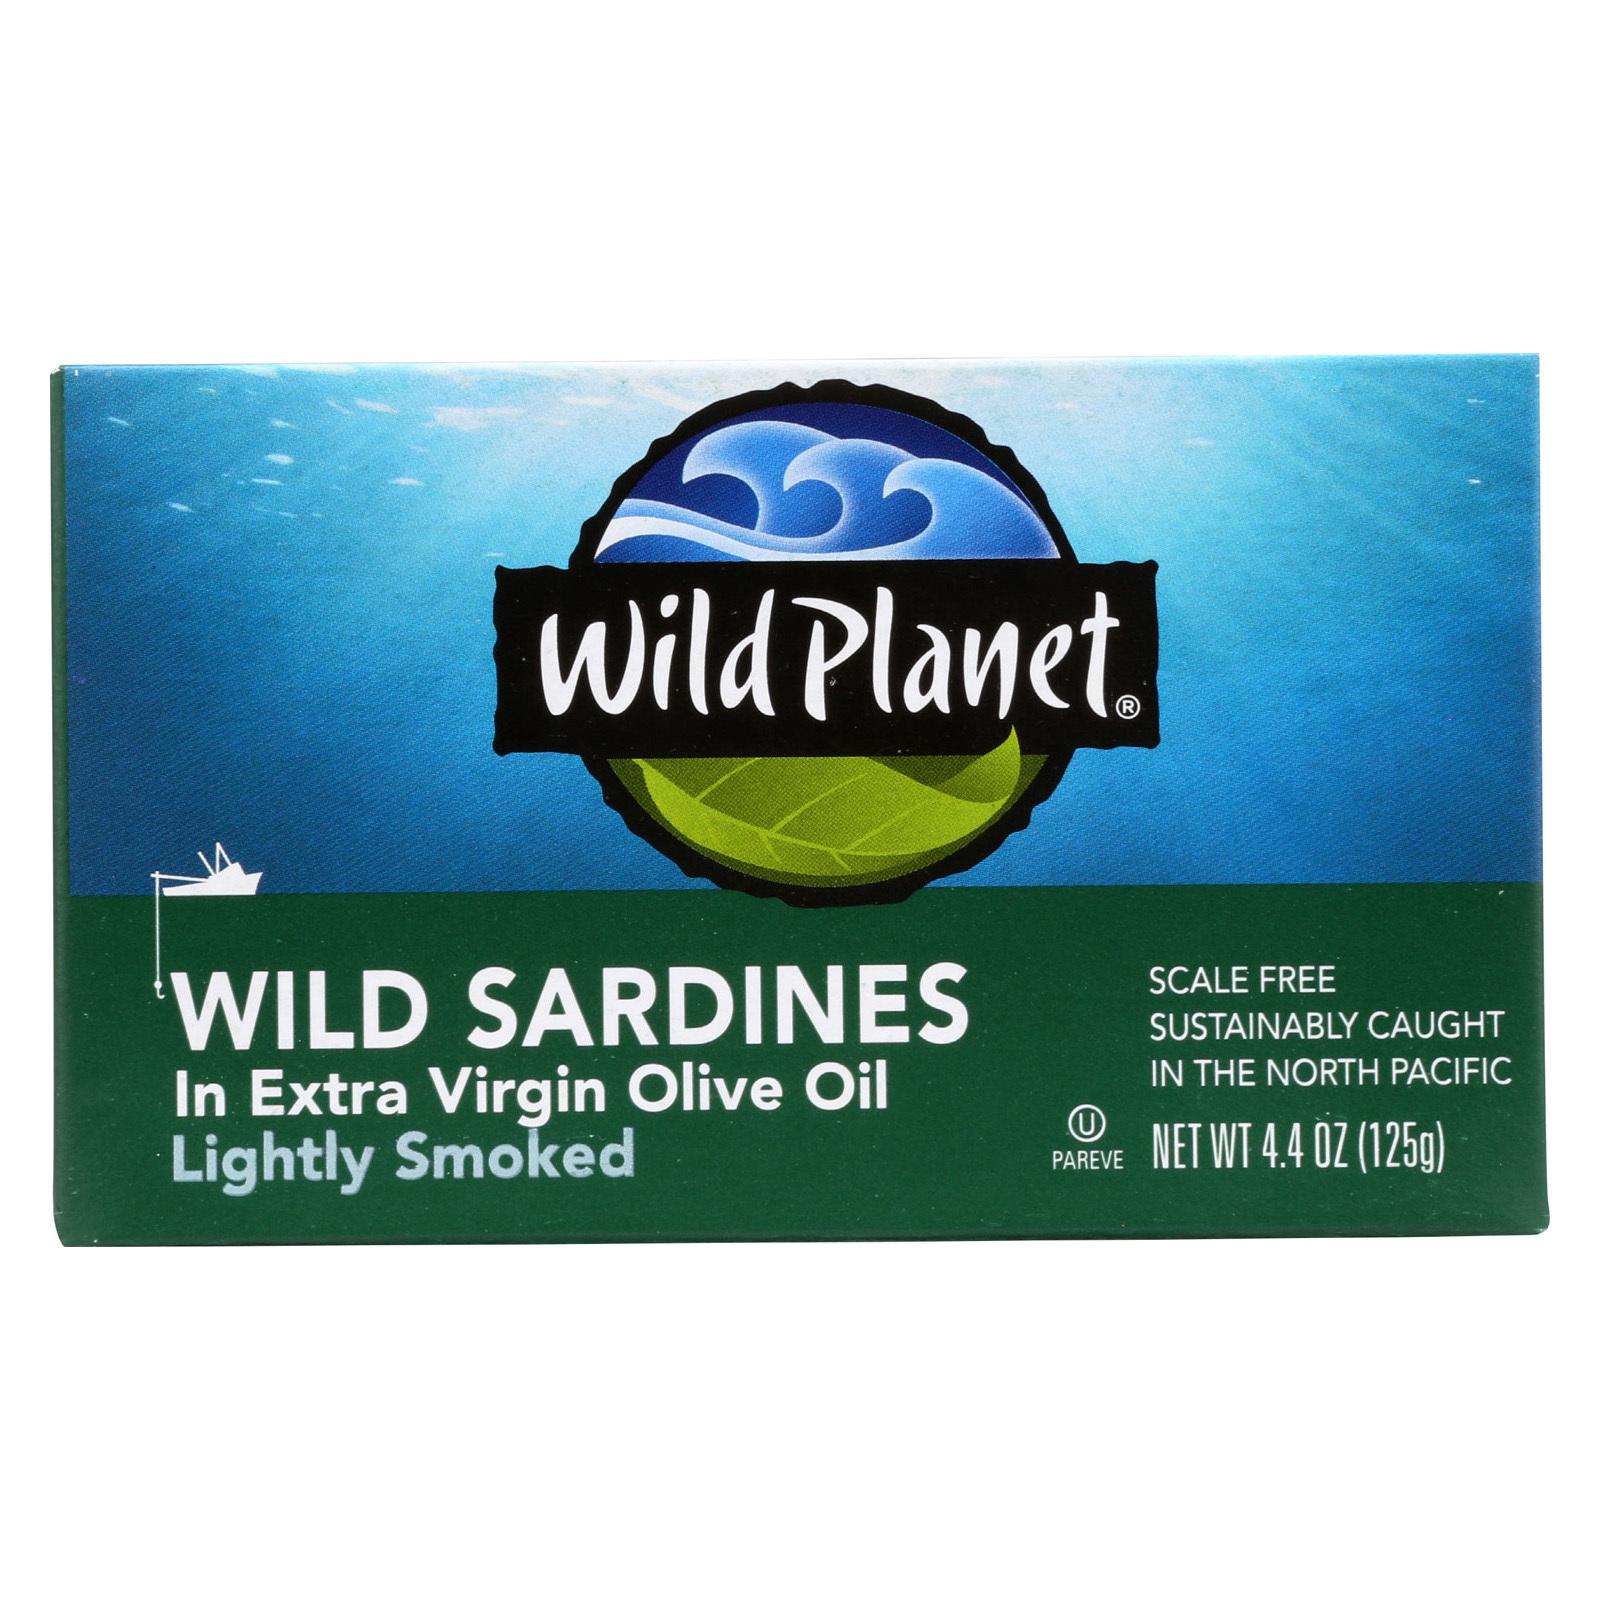 Wild Planet Wild Sardines - Extra Virgin Olive Oil - 4.4 oz